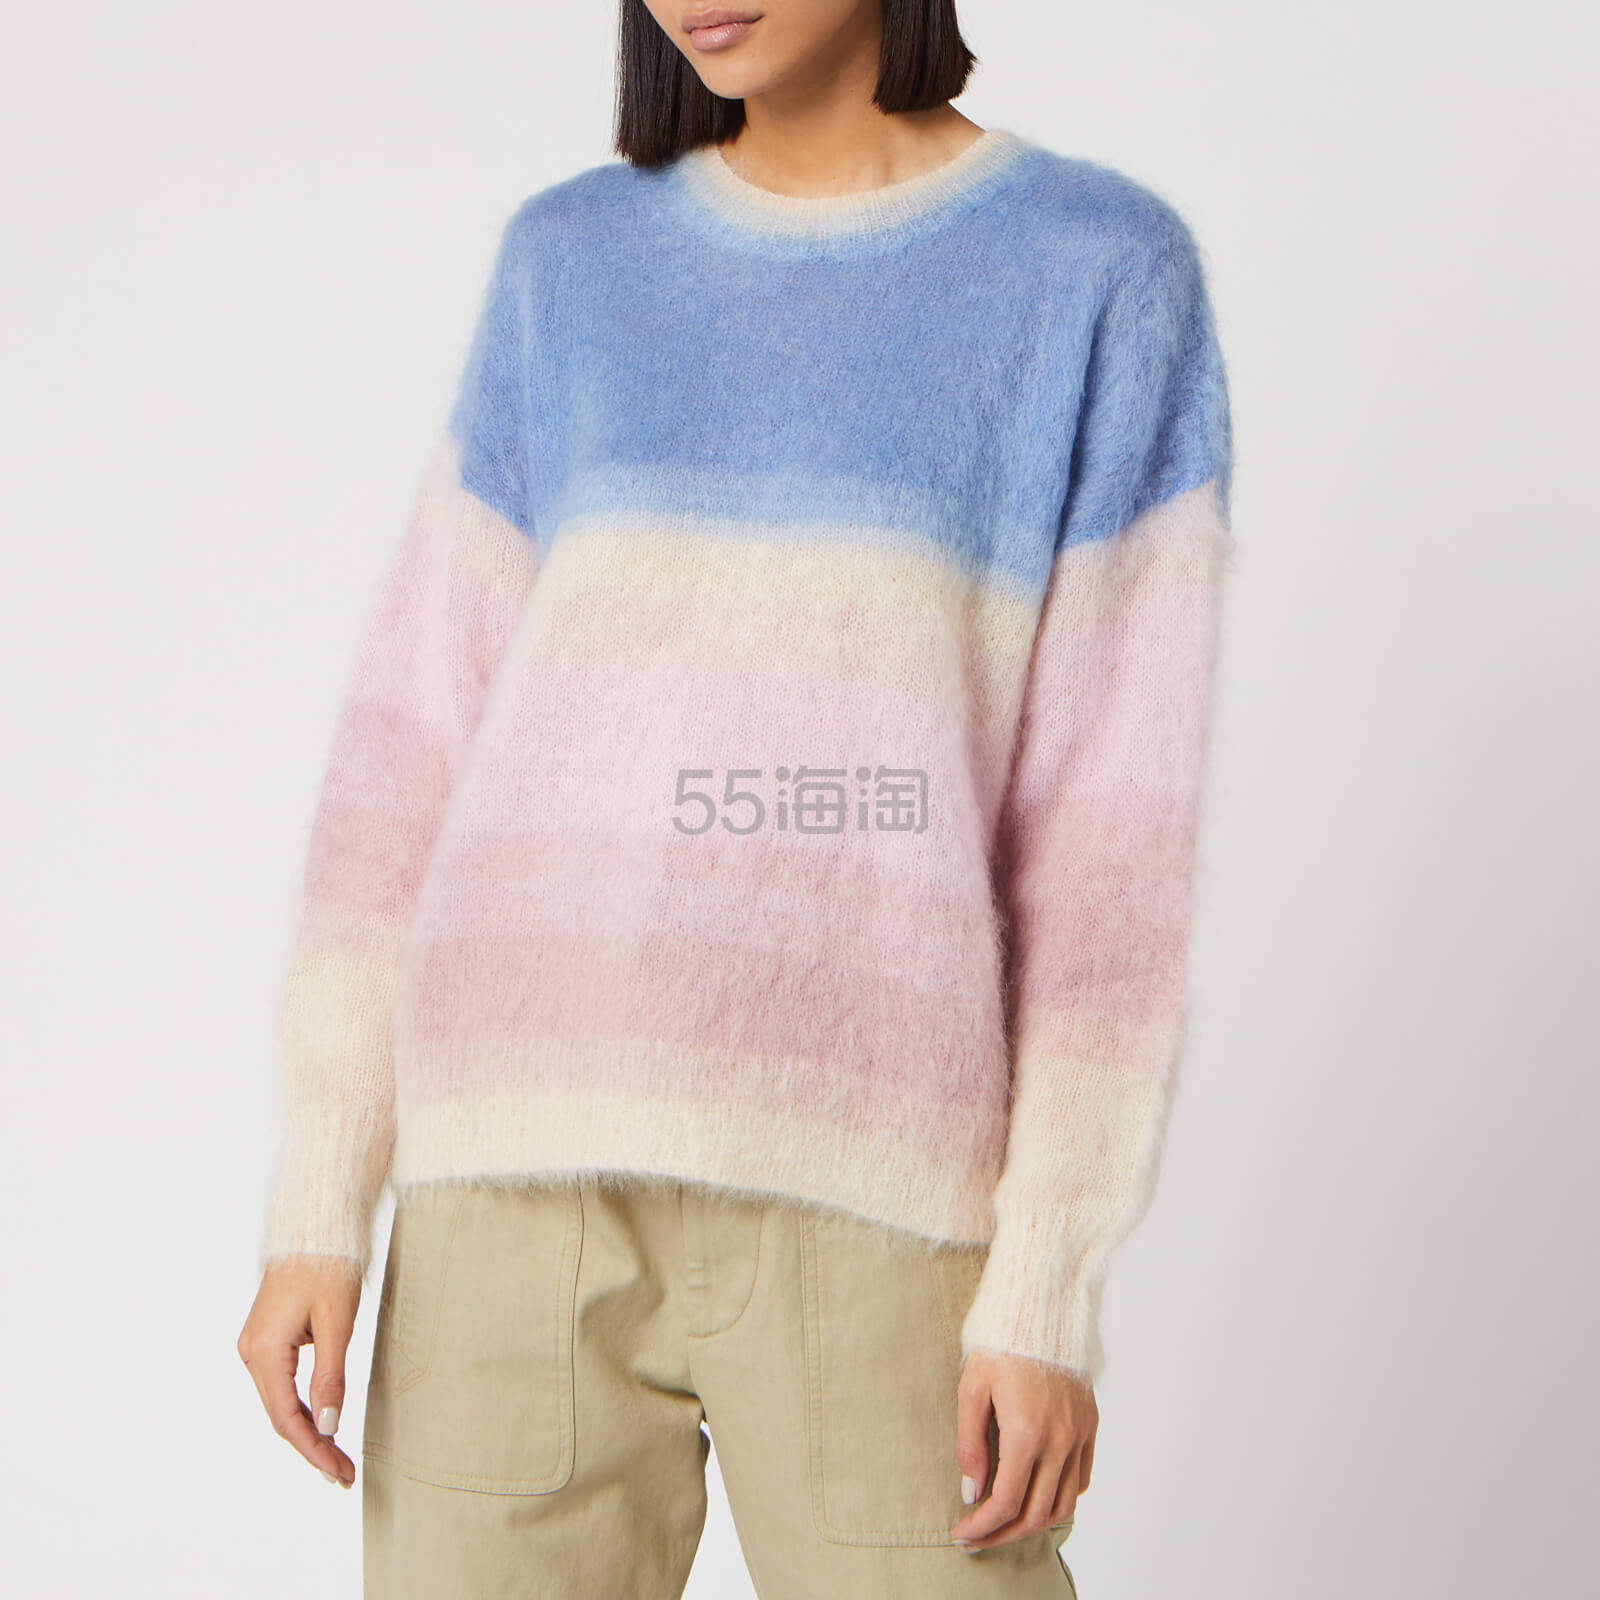 Isabel Marant Étoile 女士渐变针织衫毛衣 ¥2,483.25 - 海淘优惠海淘折扣|55海淘网